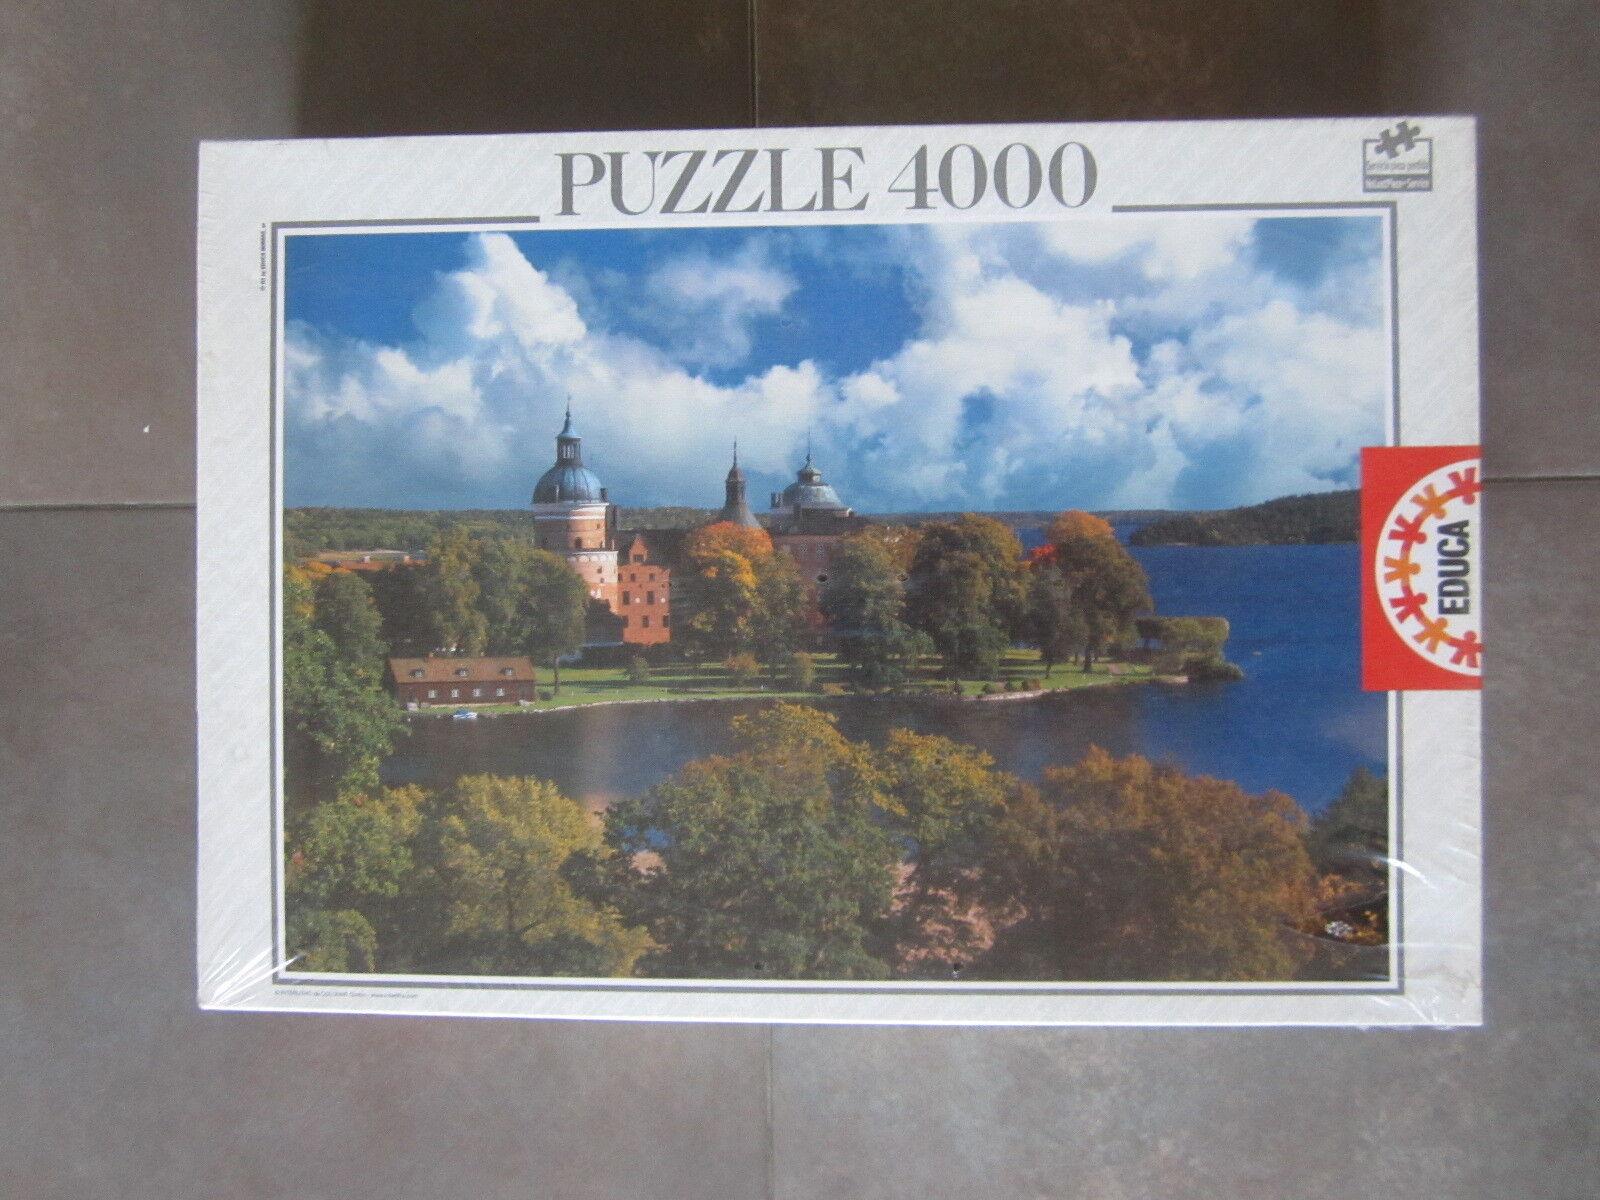 PUZZLE 4000 EDUCA  IMAGEN DROTTNINGHOLM SUECIA  136 136 136 X 96 CM. NUEVO SIN ABRIR 8b0d2c